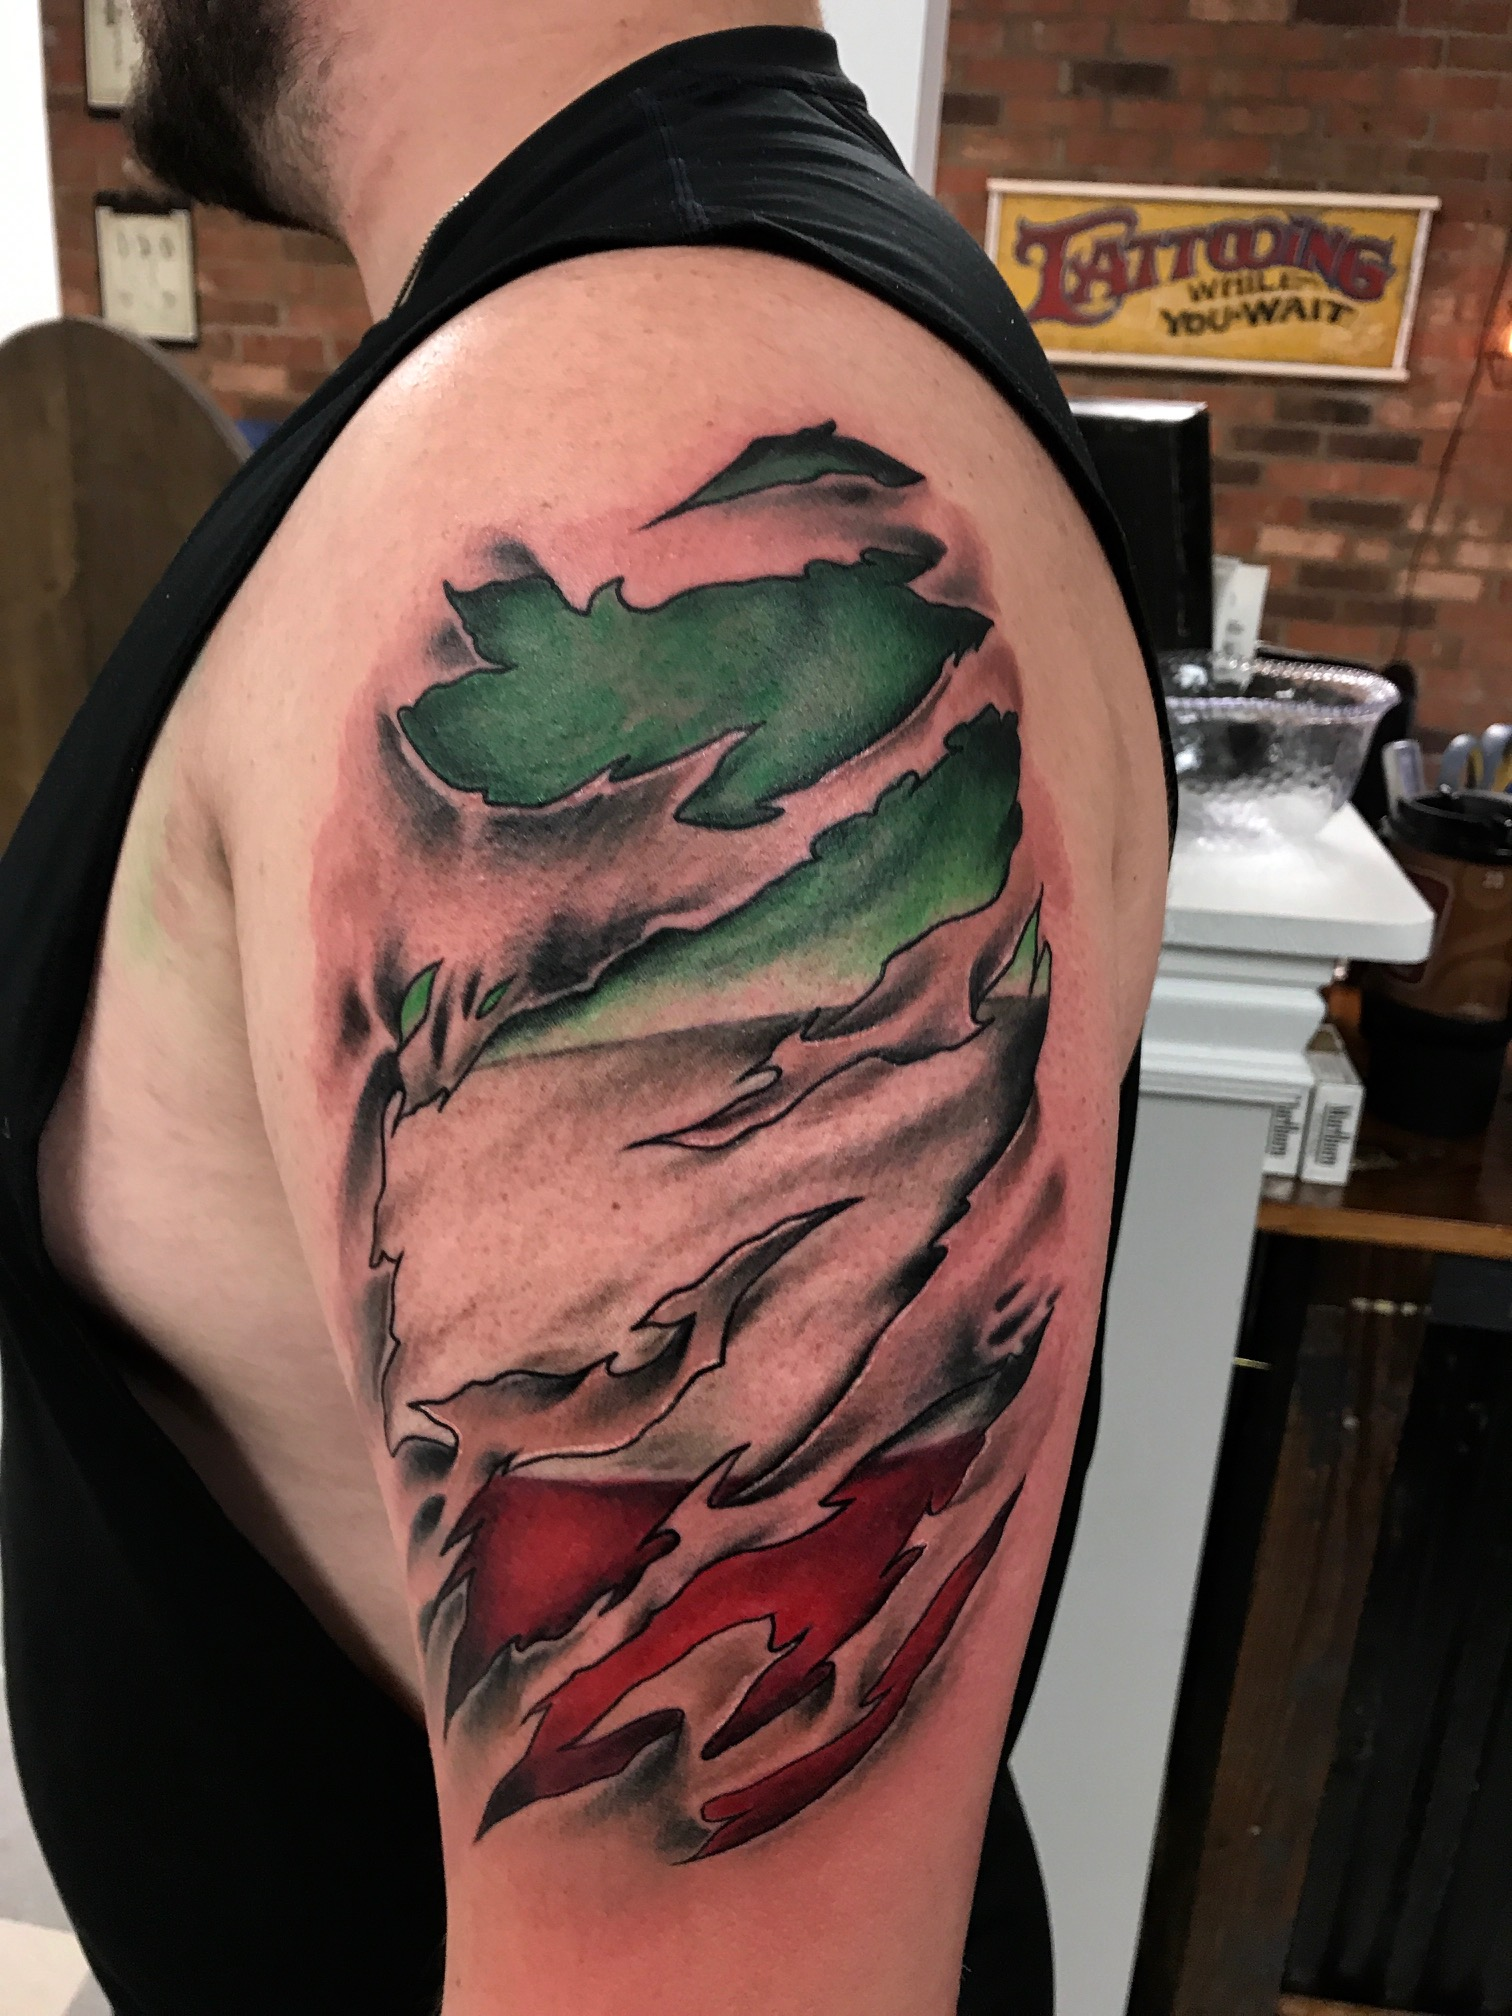 Italian Flag Tattoo.jpg